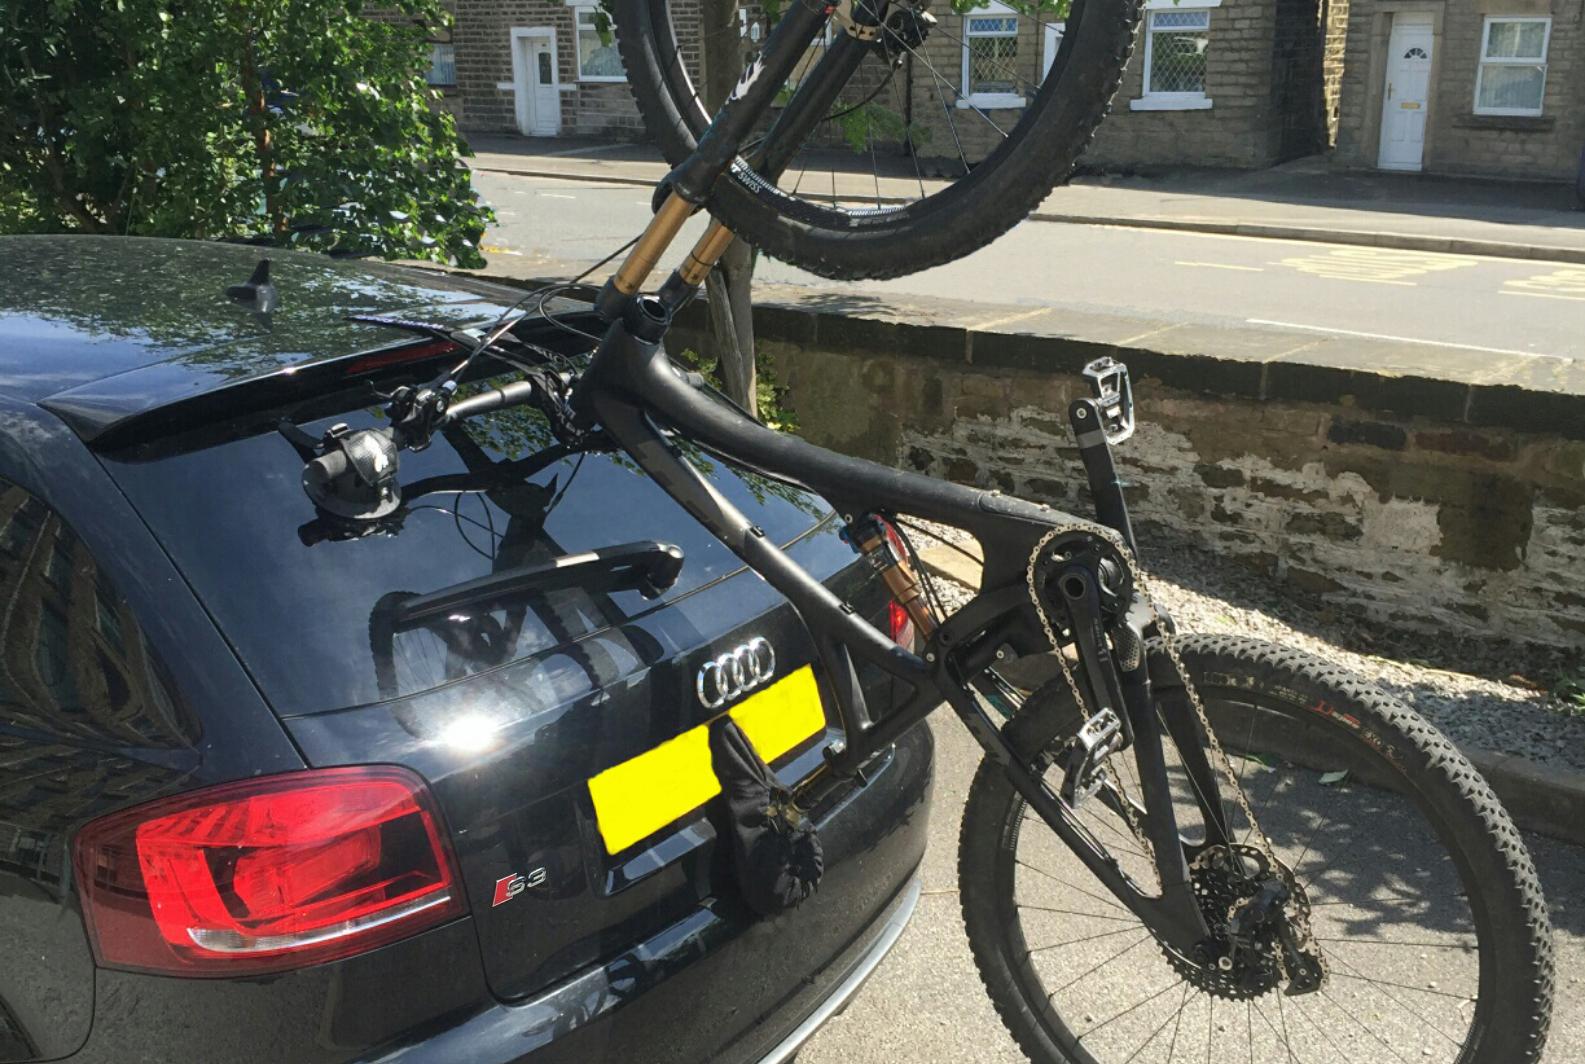 Audi S3 Bike Rack Buyers Guide 2020